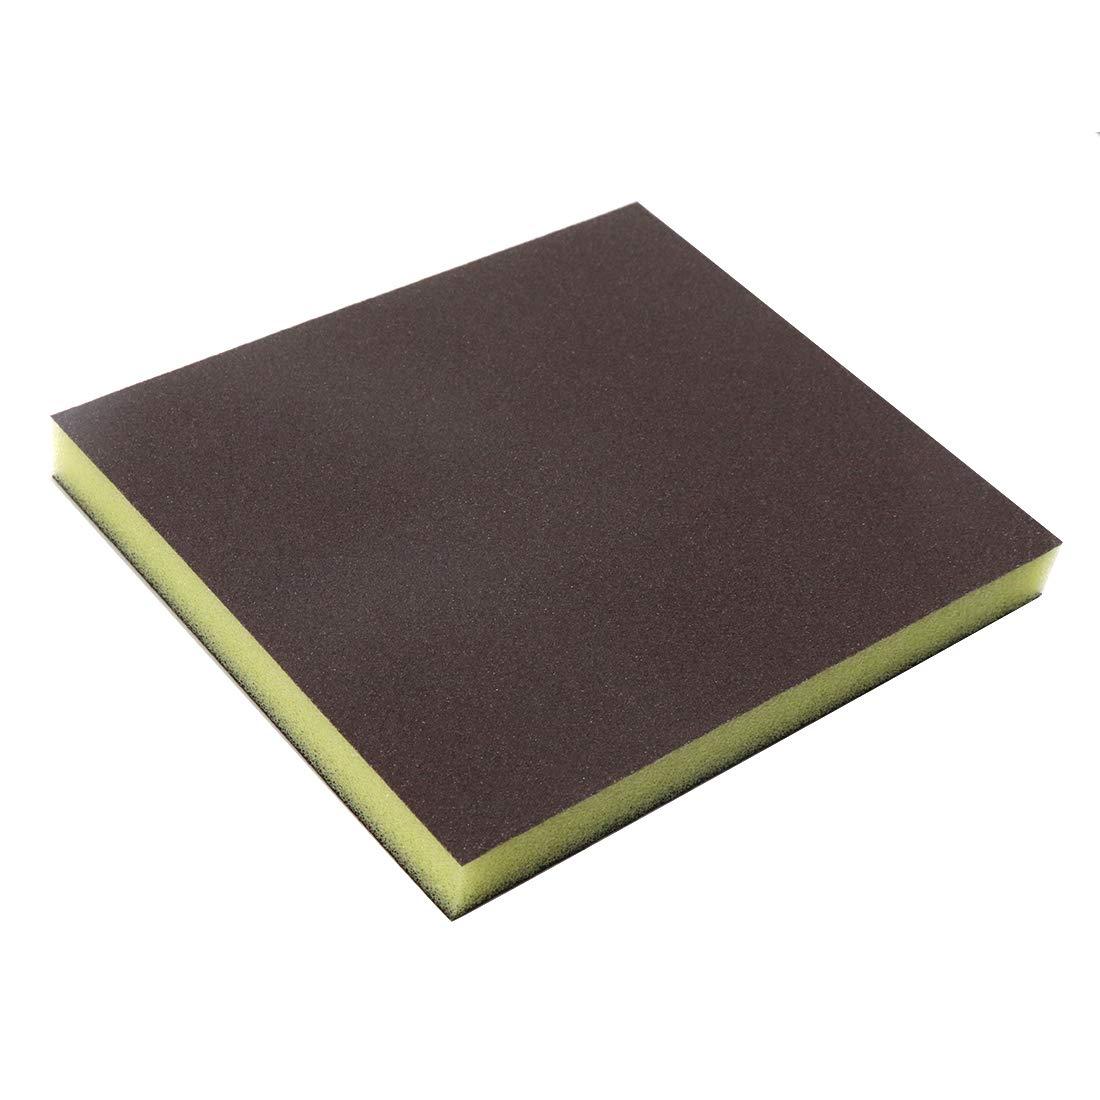 180 Grit ZXHAO Sanding Sponge Sanding Blocks 12pcs Manual Sanding ...